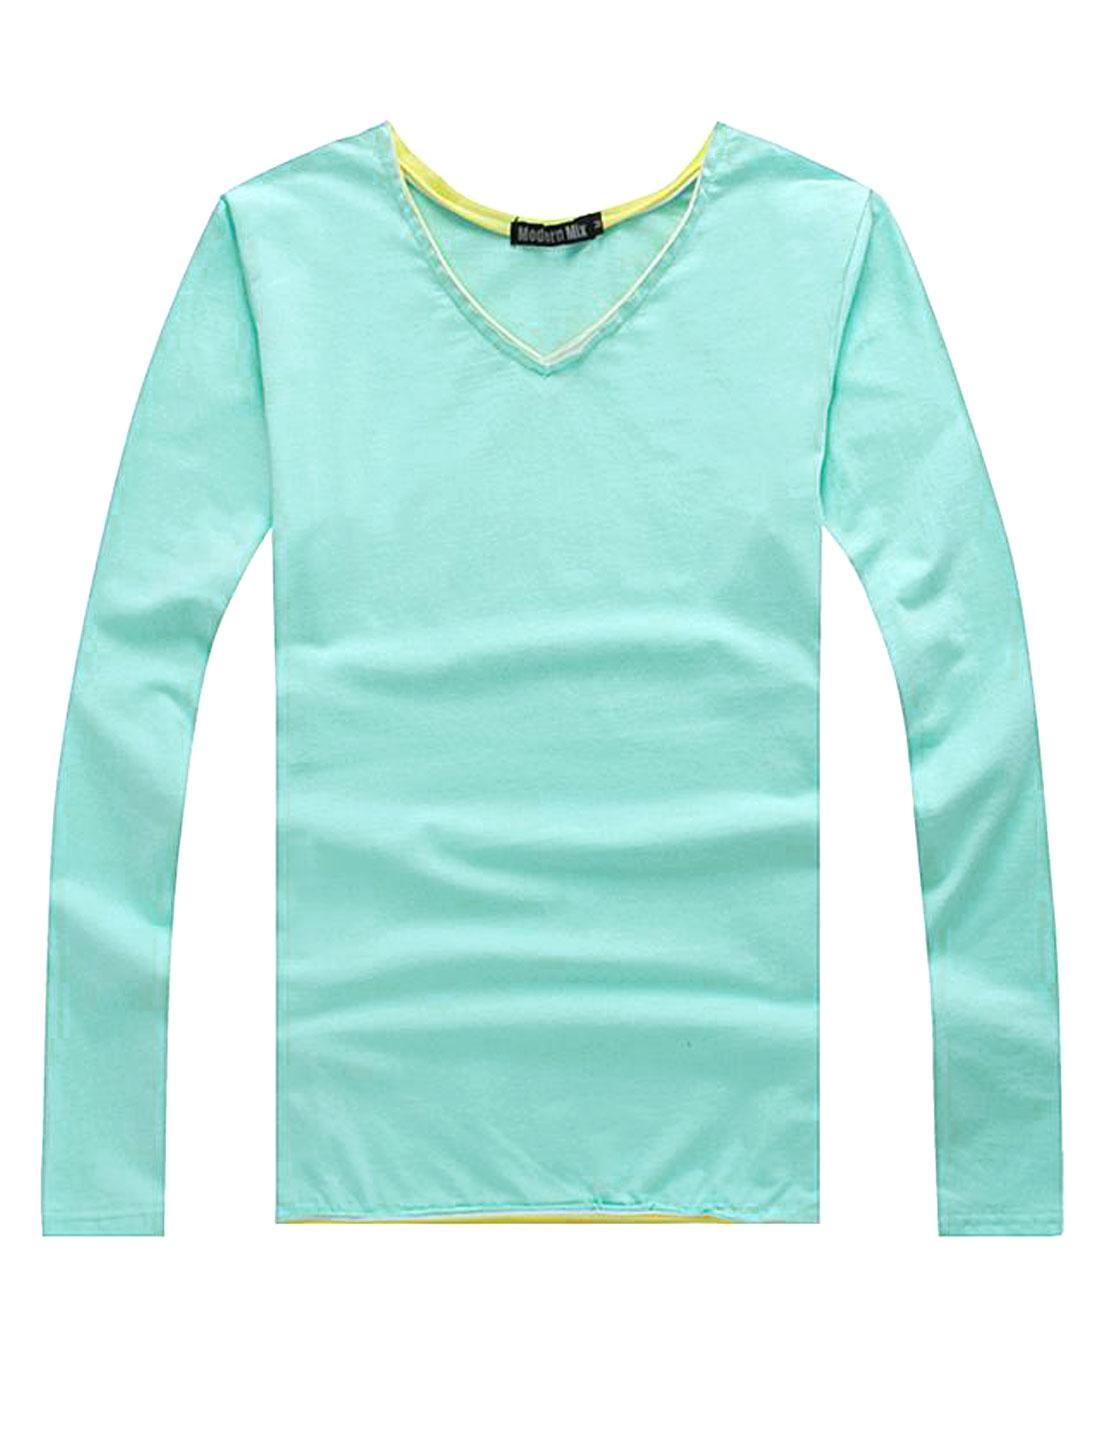 Cozy Fit V Neck Patched Detail Shirt for Men Light Blue M